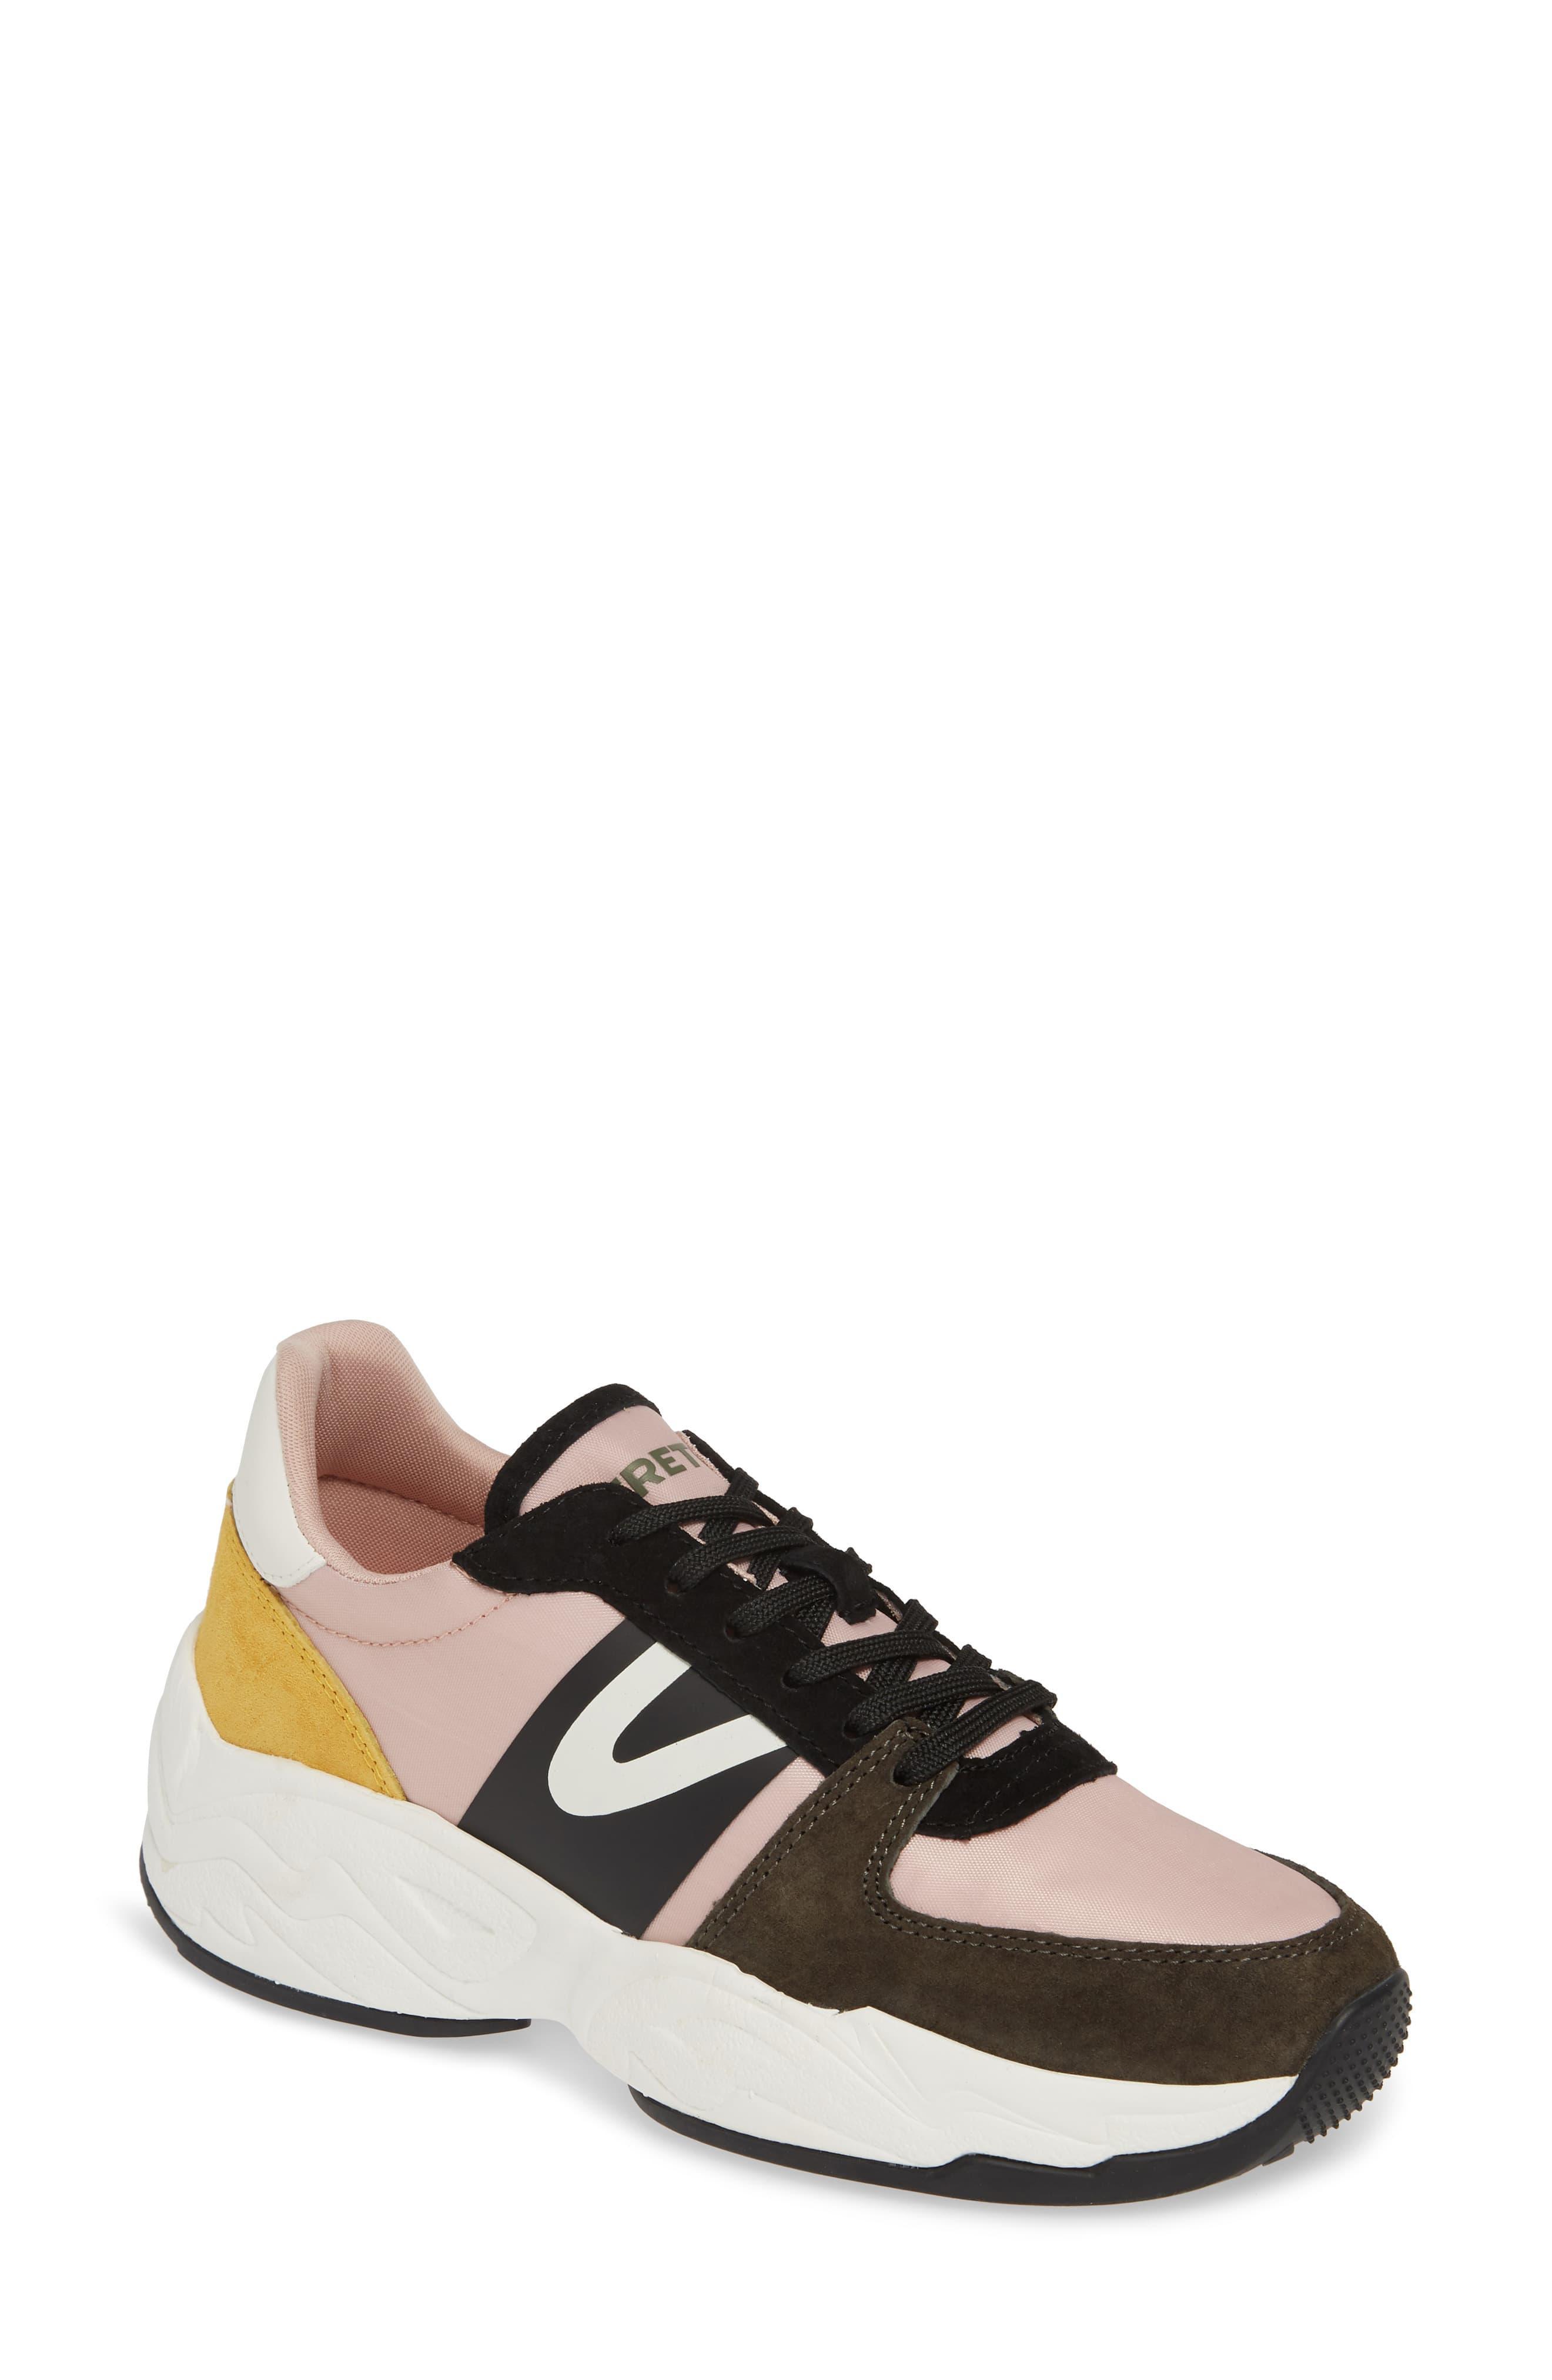 Tretorn Lexie3 Sneaker - Lyst